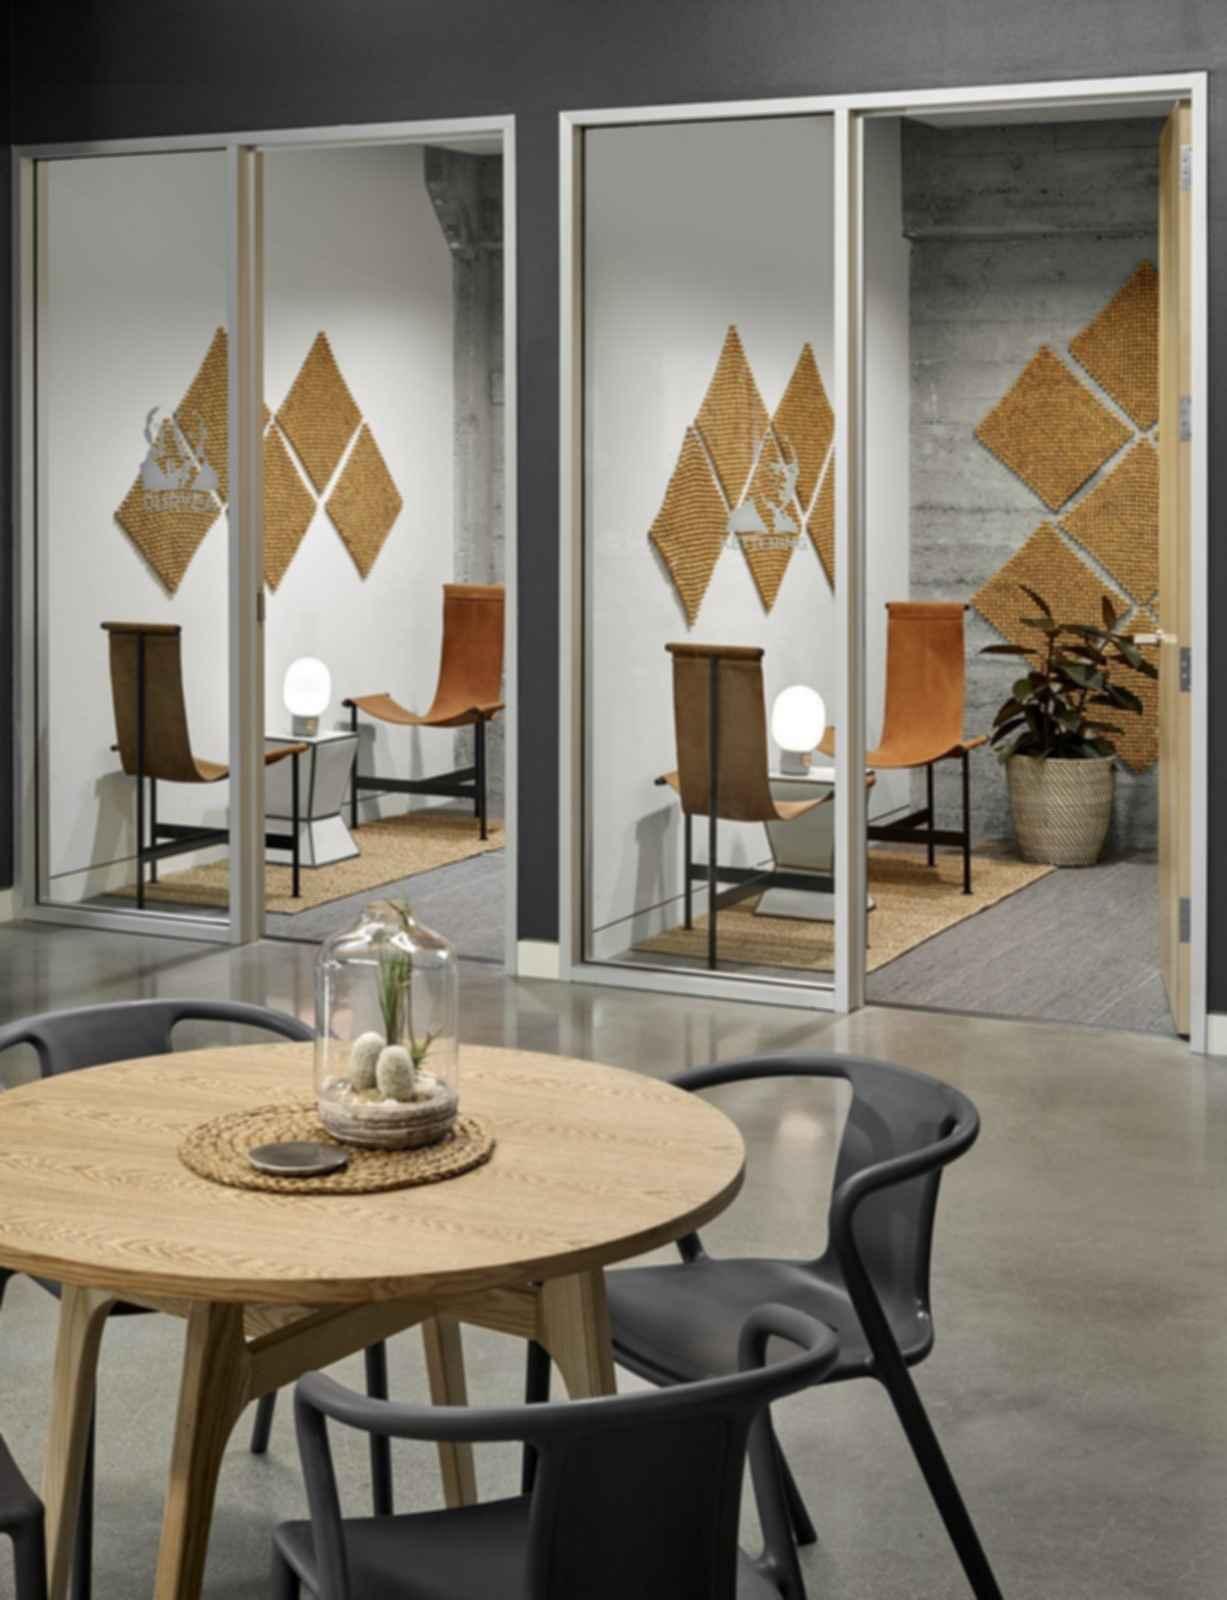 Metromile - Office Spaces